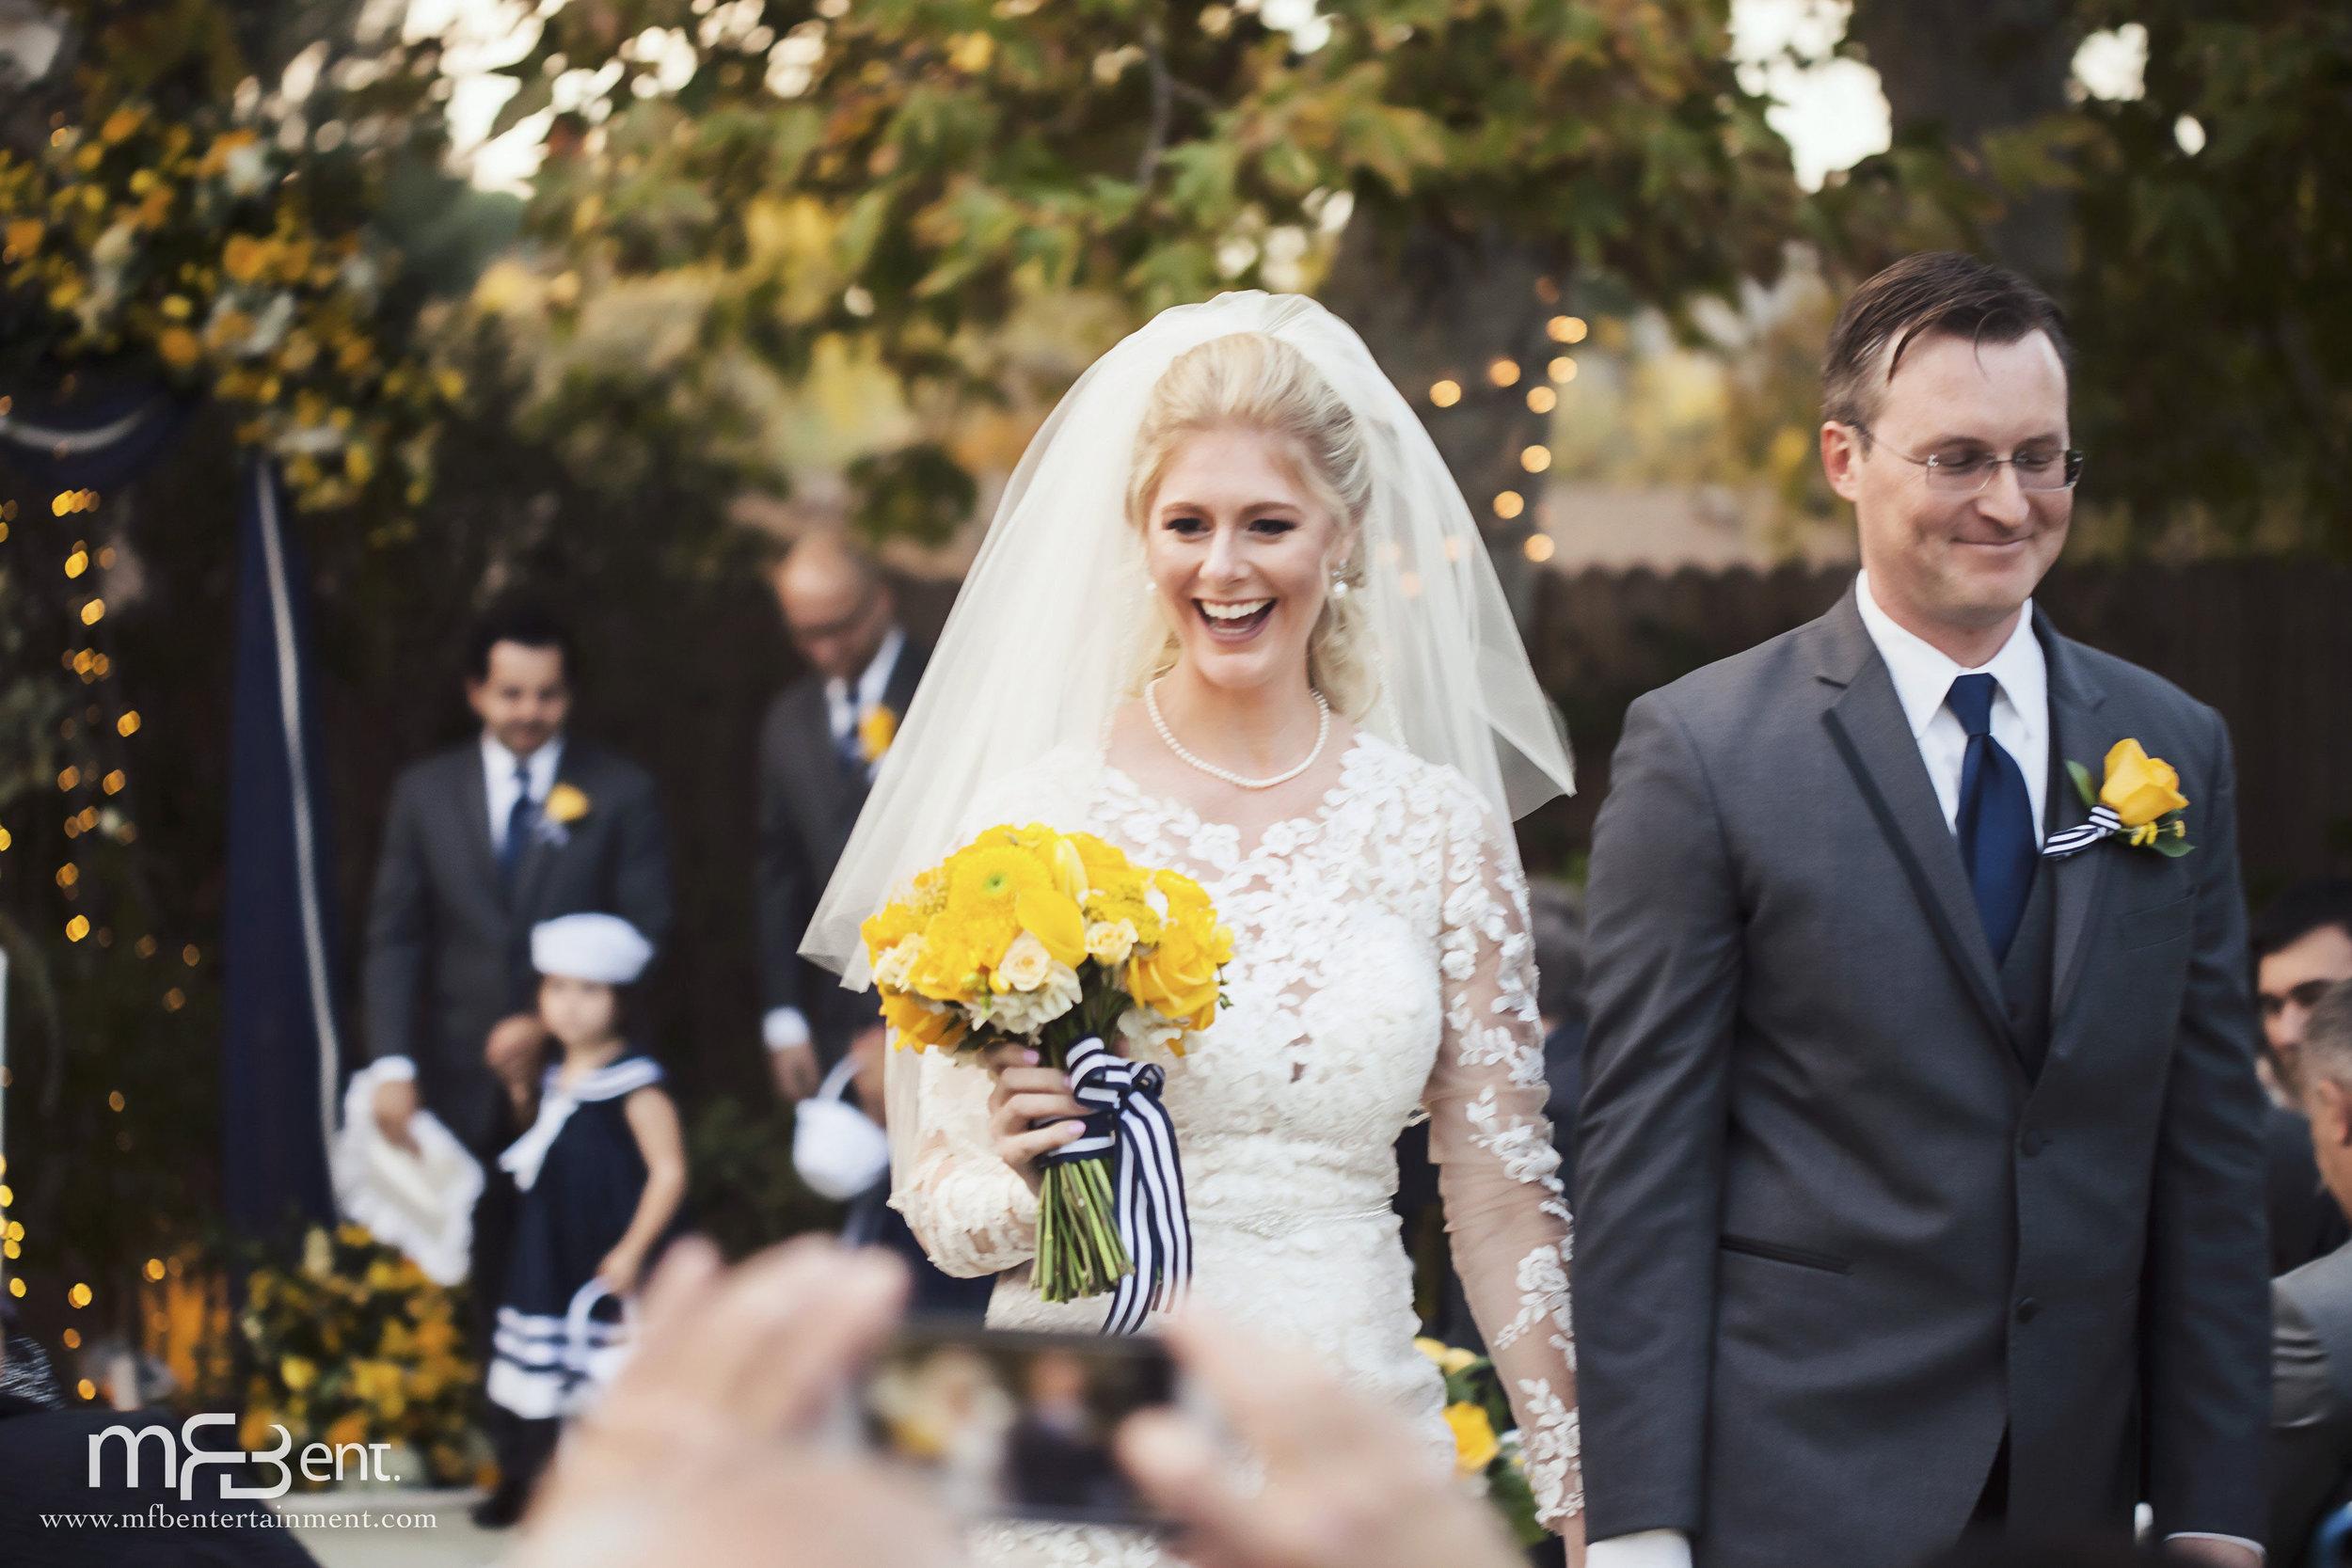 PIOTR CHELSEA WEDDING-CEREMONY-0145 L.jpg